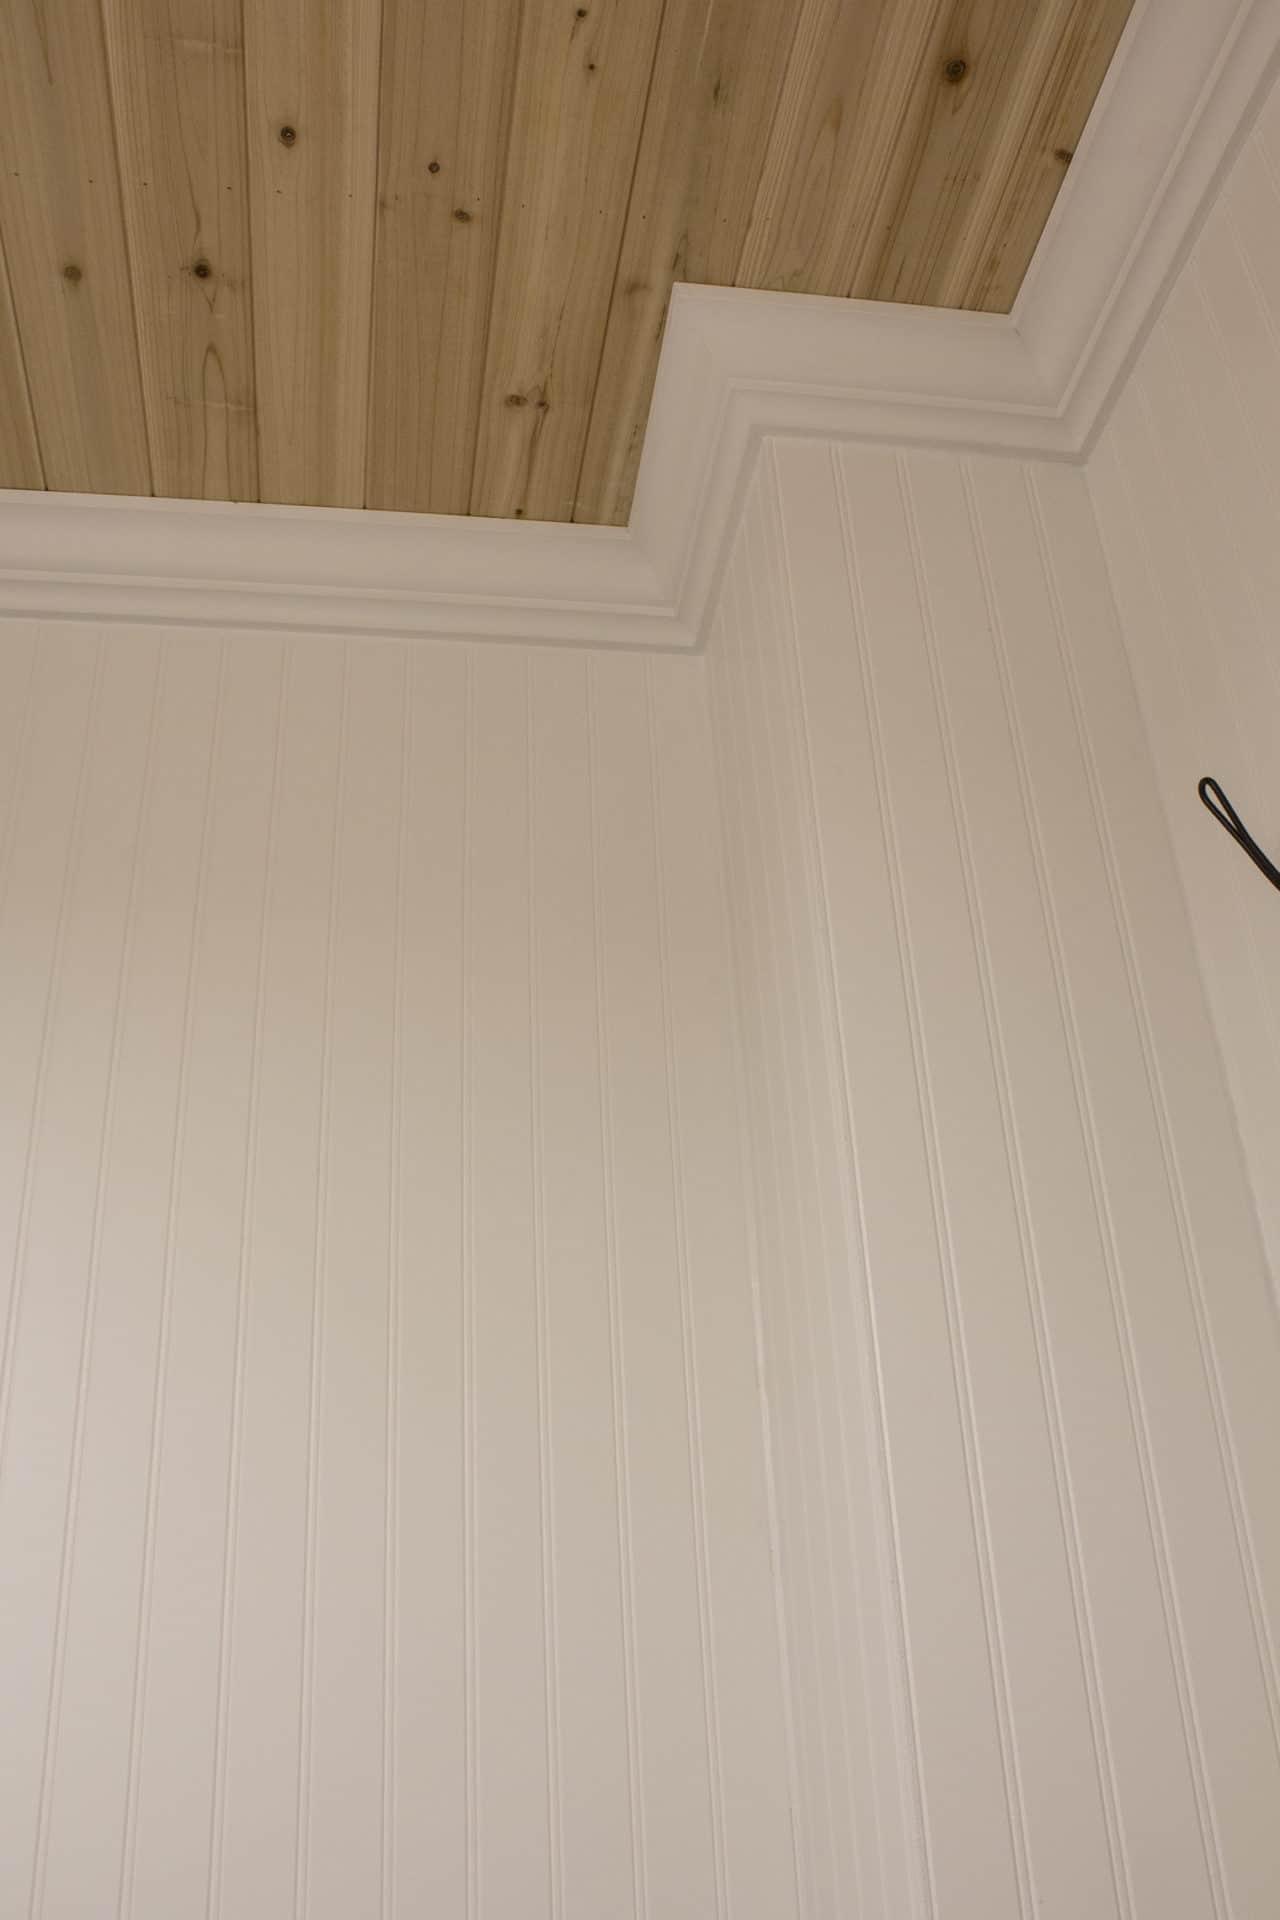 beadboard, crown molding, cedar ceiling detail